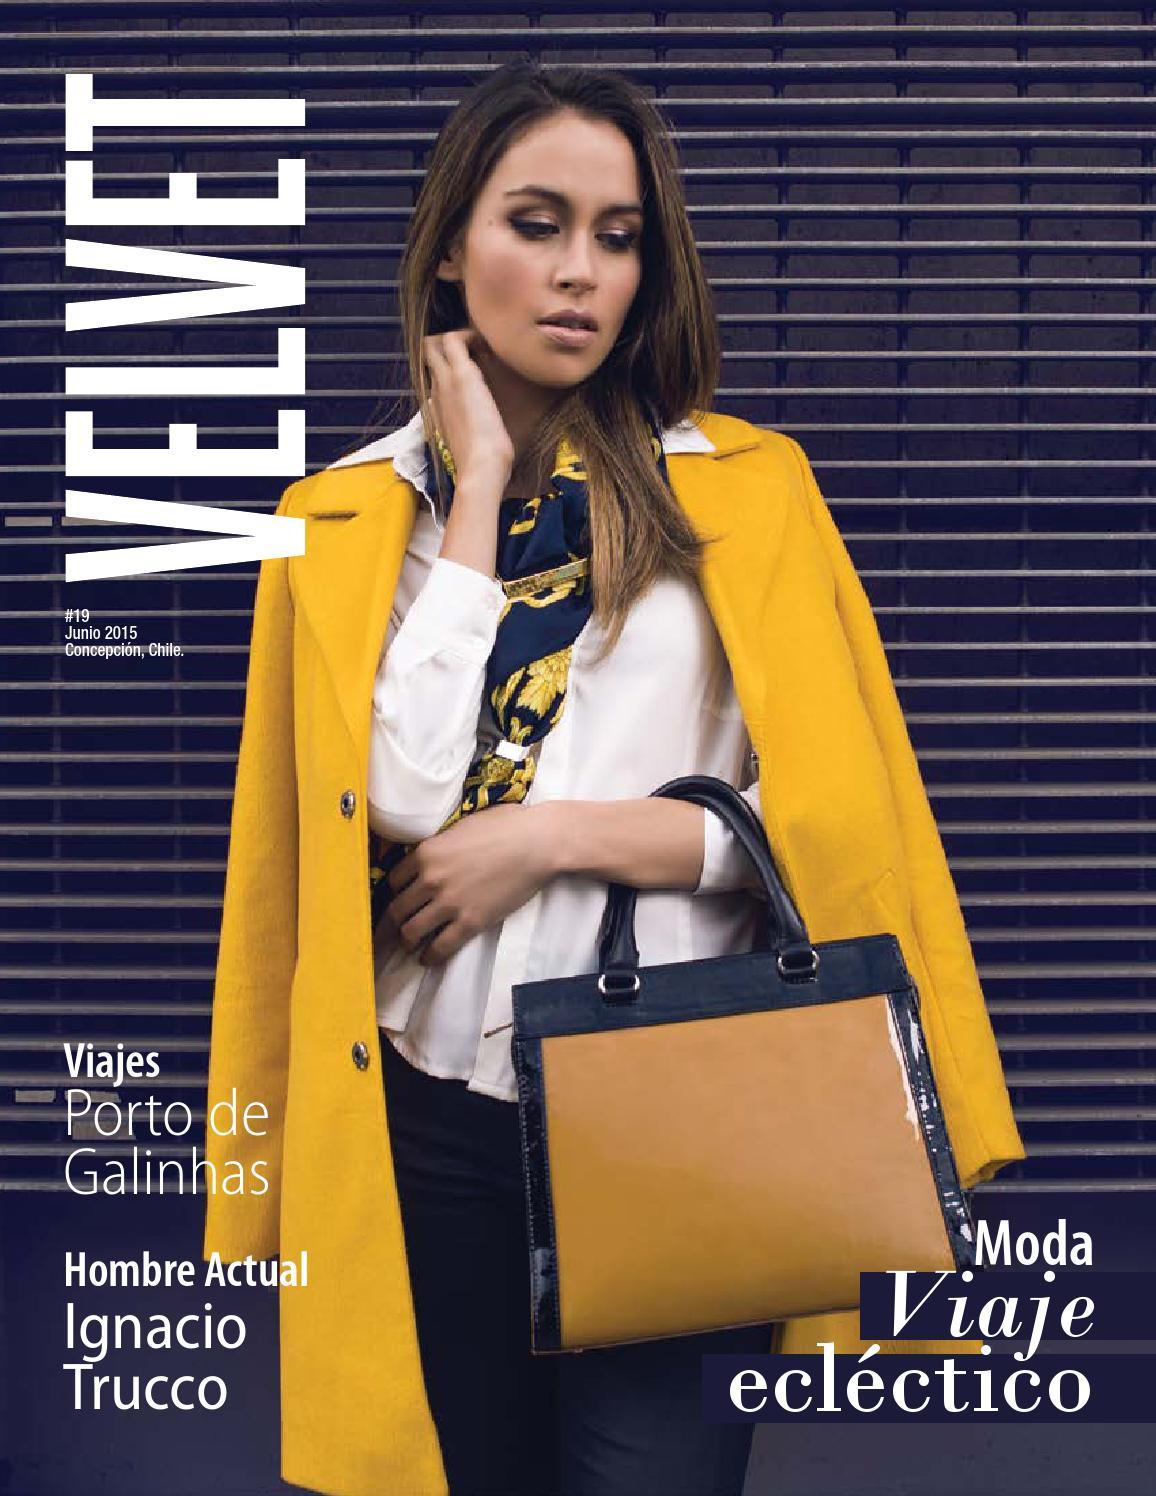 Revista Velvet  19 Junio 2015 by Revista Velvet - issuu 98049f74ff8